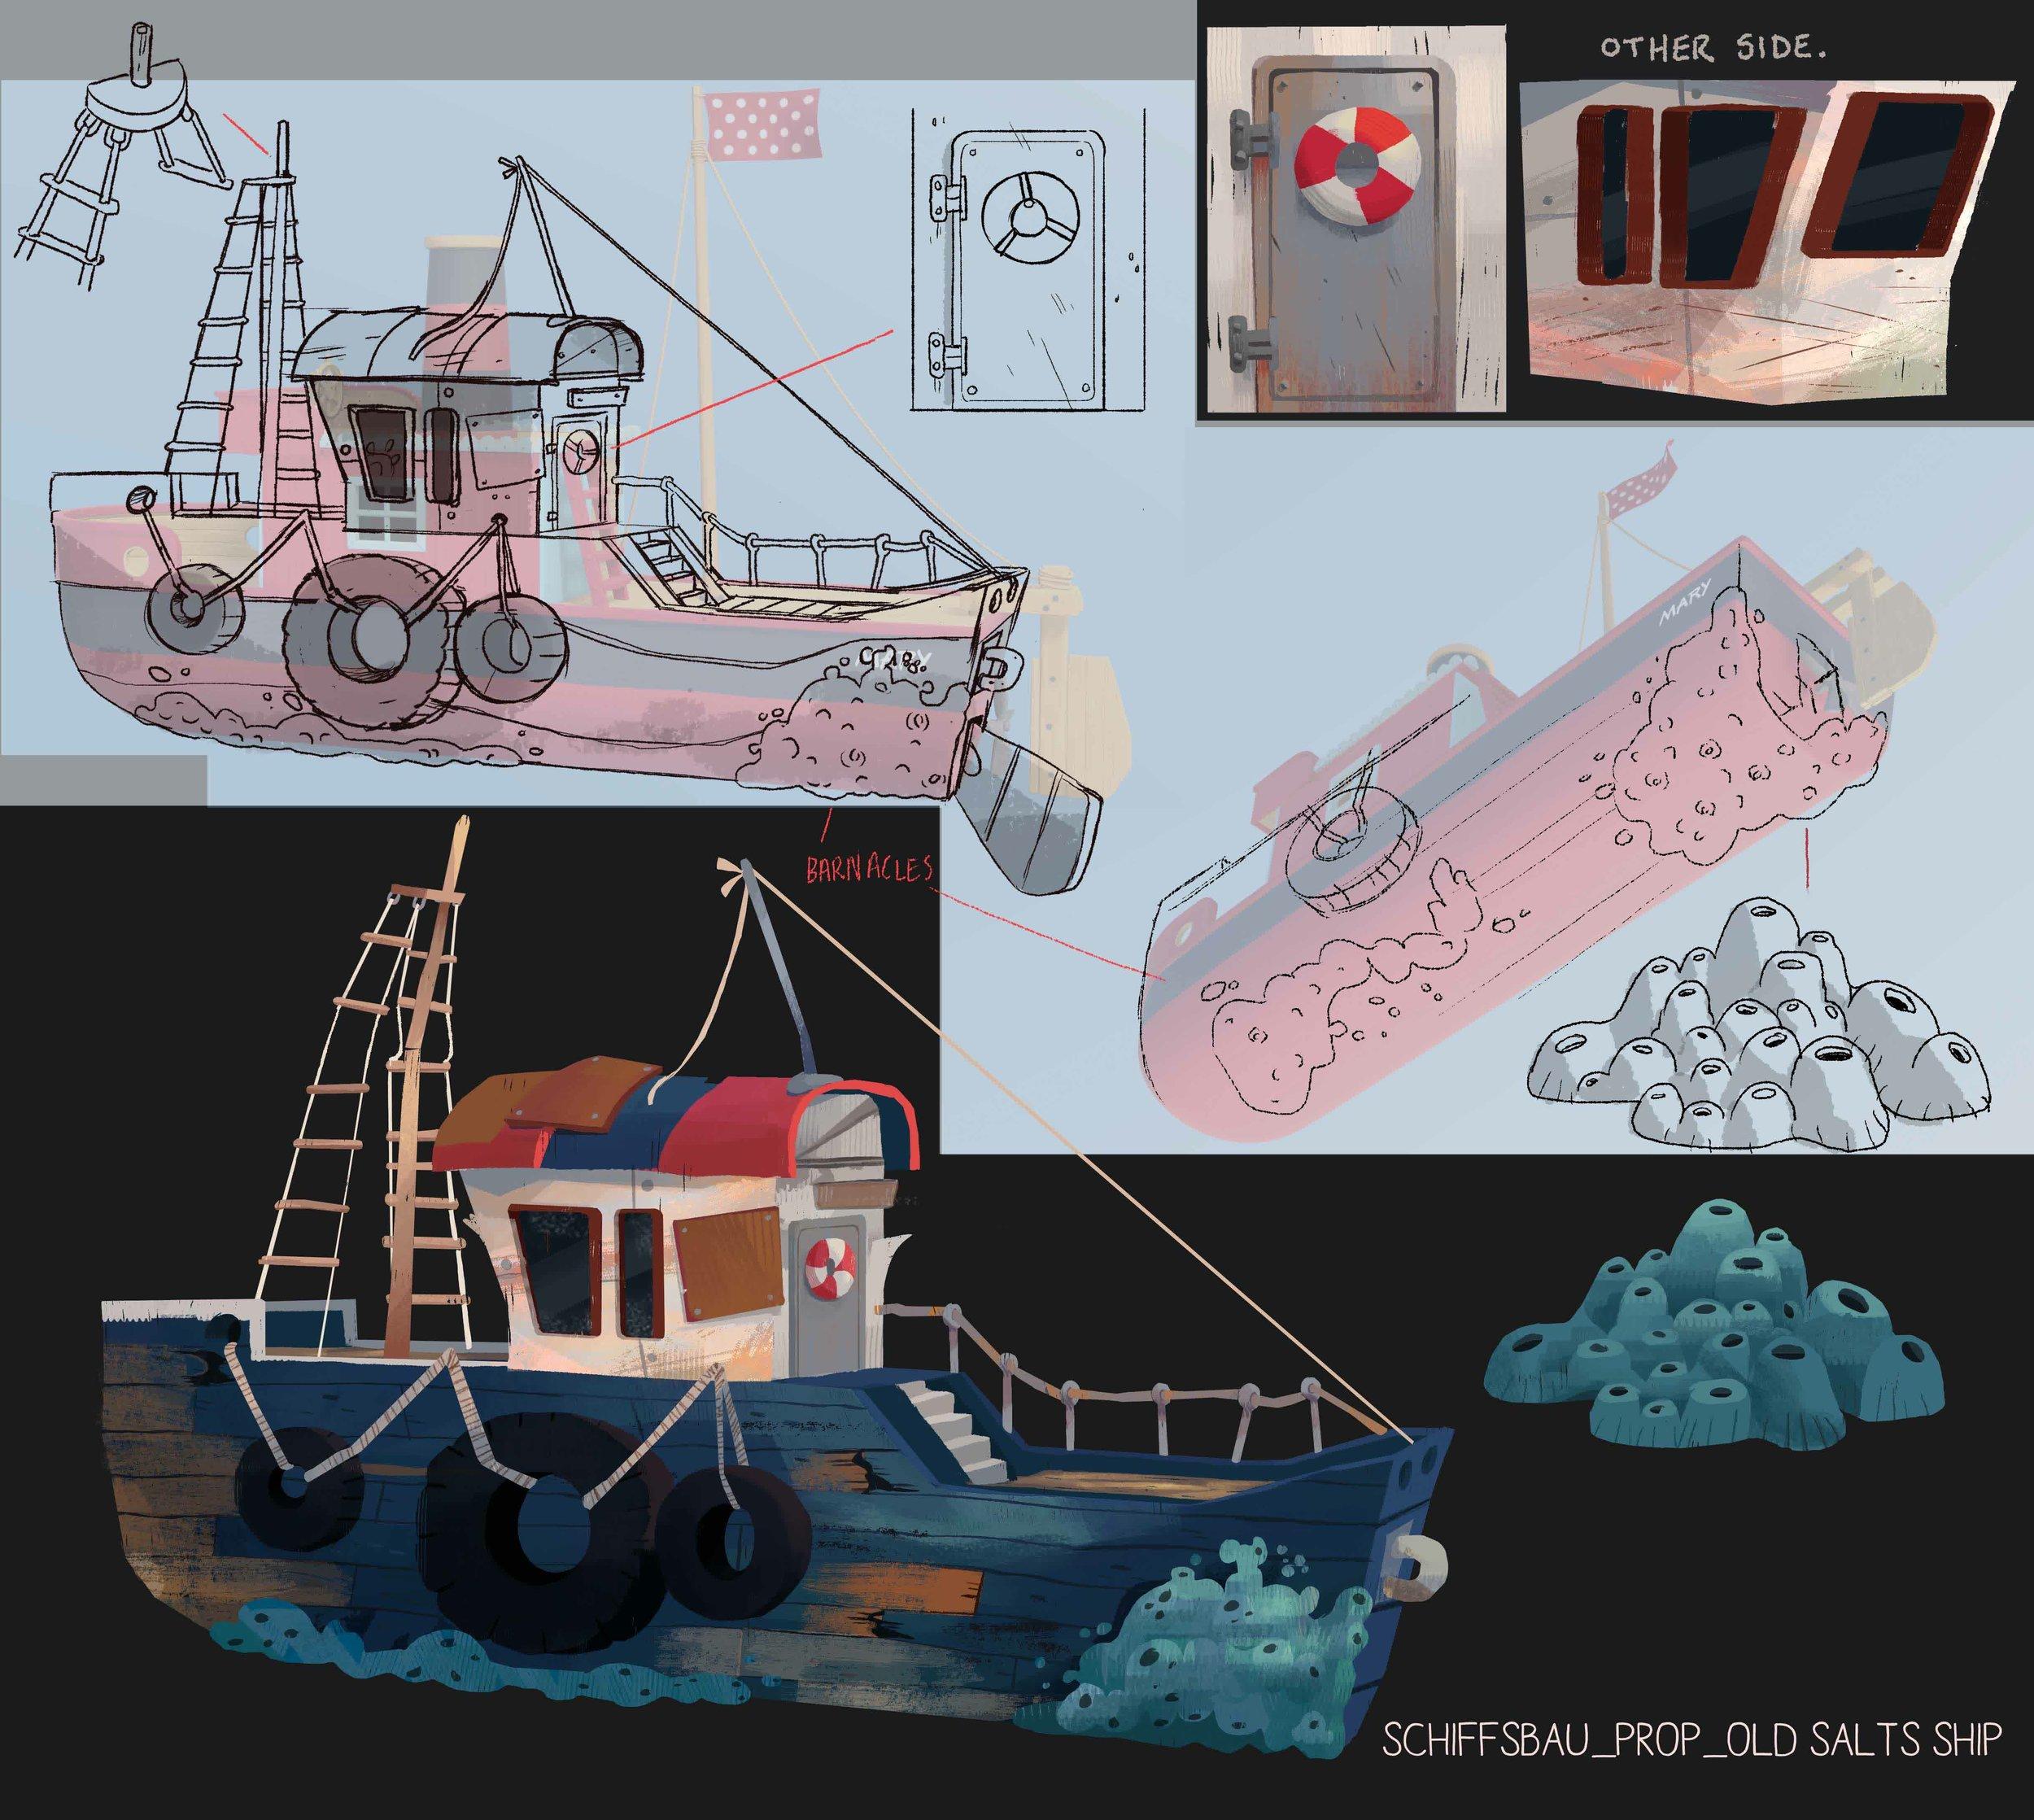 PROPS_ShipOldSalt_DESIGN_OldSaltShipMODELSHEET.v003_thumb.jpg